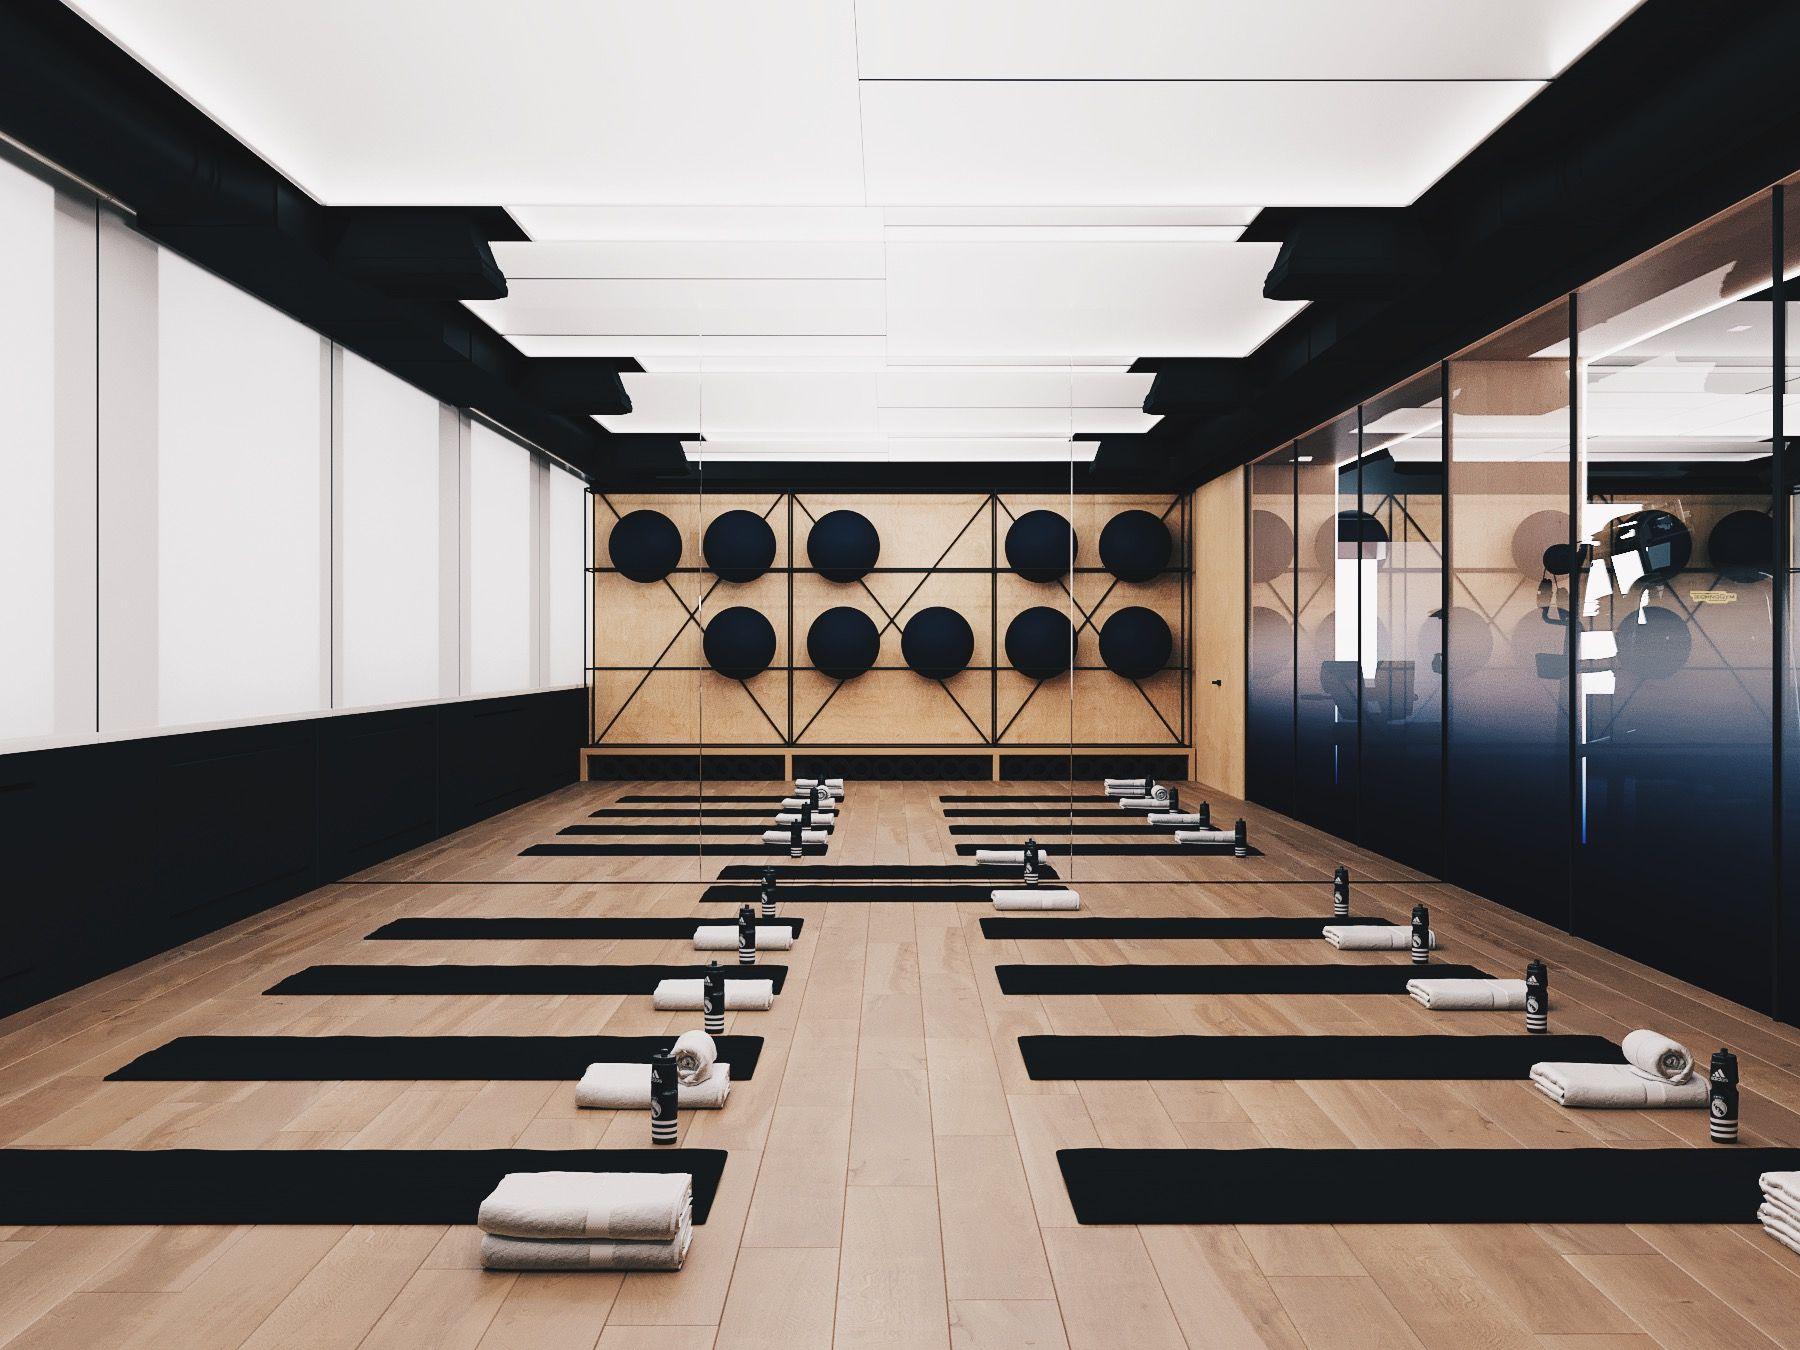 Pin Von Bokica As Auf Yoga Studio In 2020 Fitnessroom Fitnessraum Fitness Humor